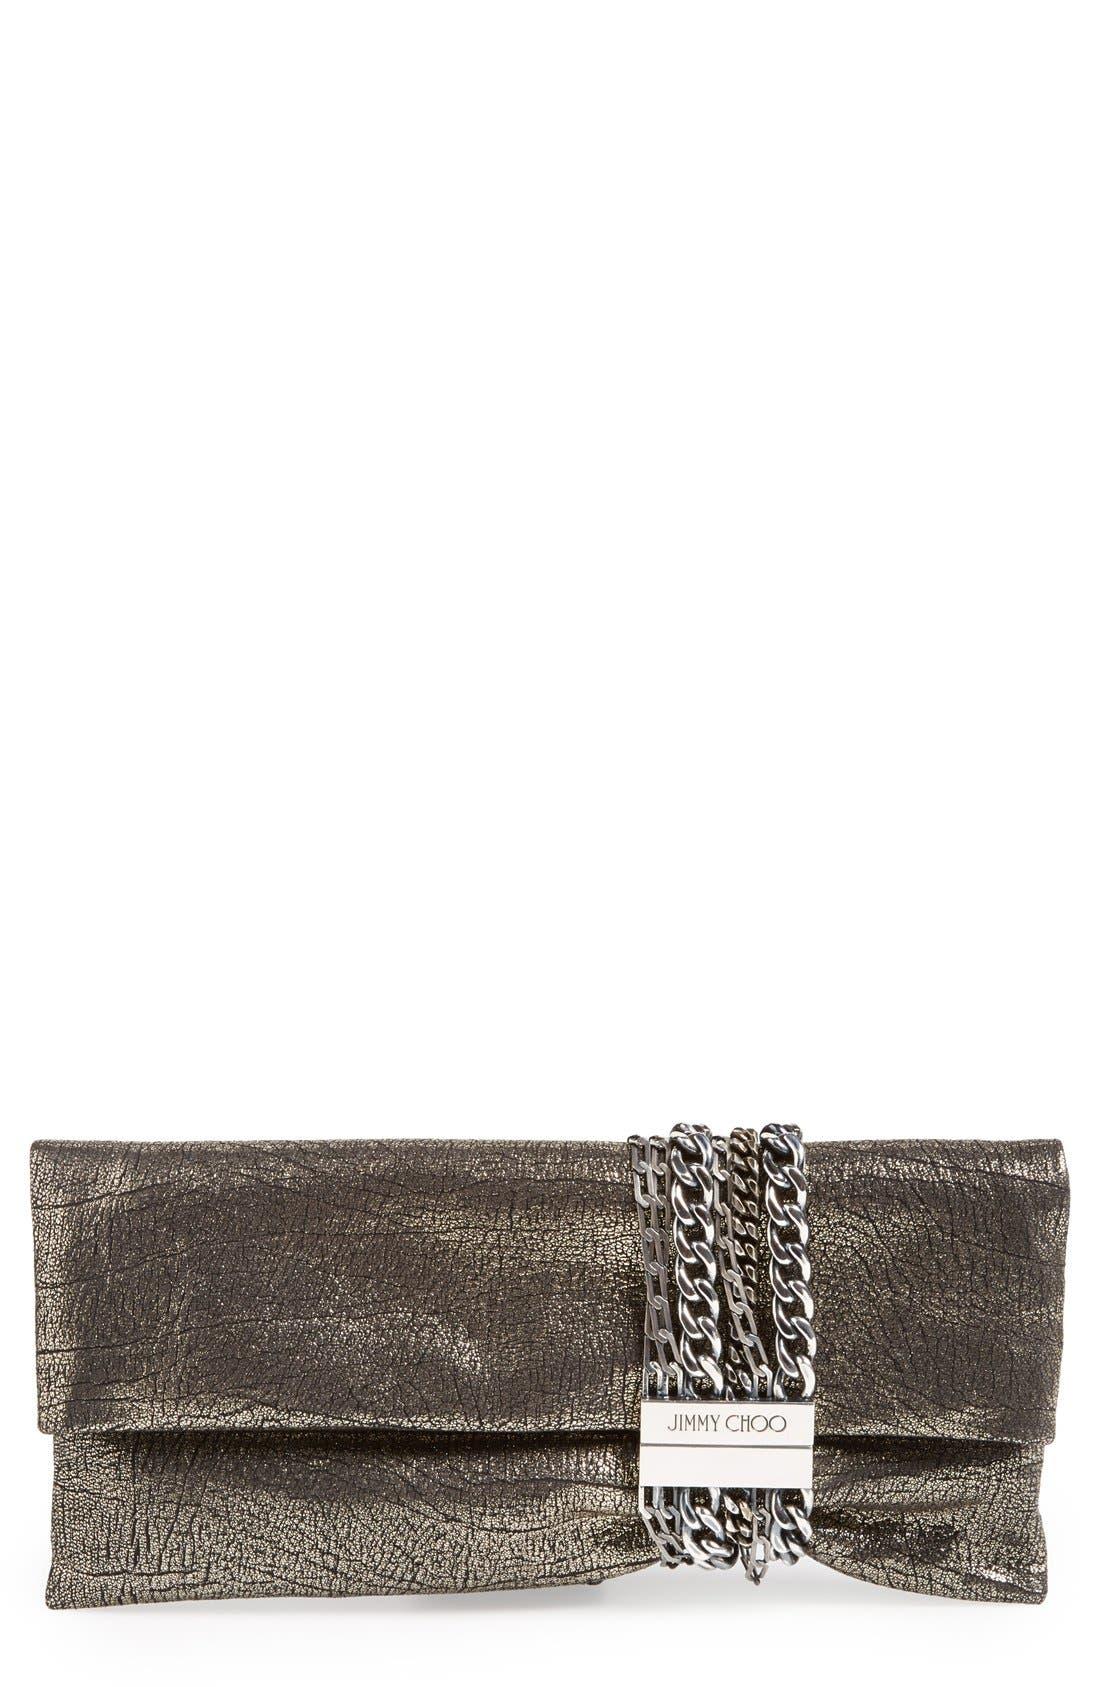 Main Image - Jimmy Choo 'Chandra' Leather Clutch